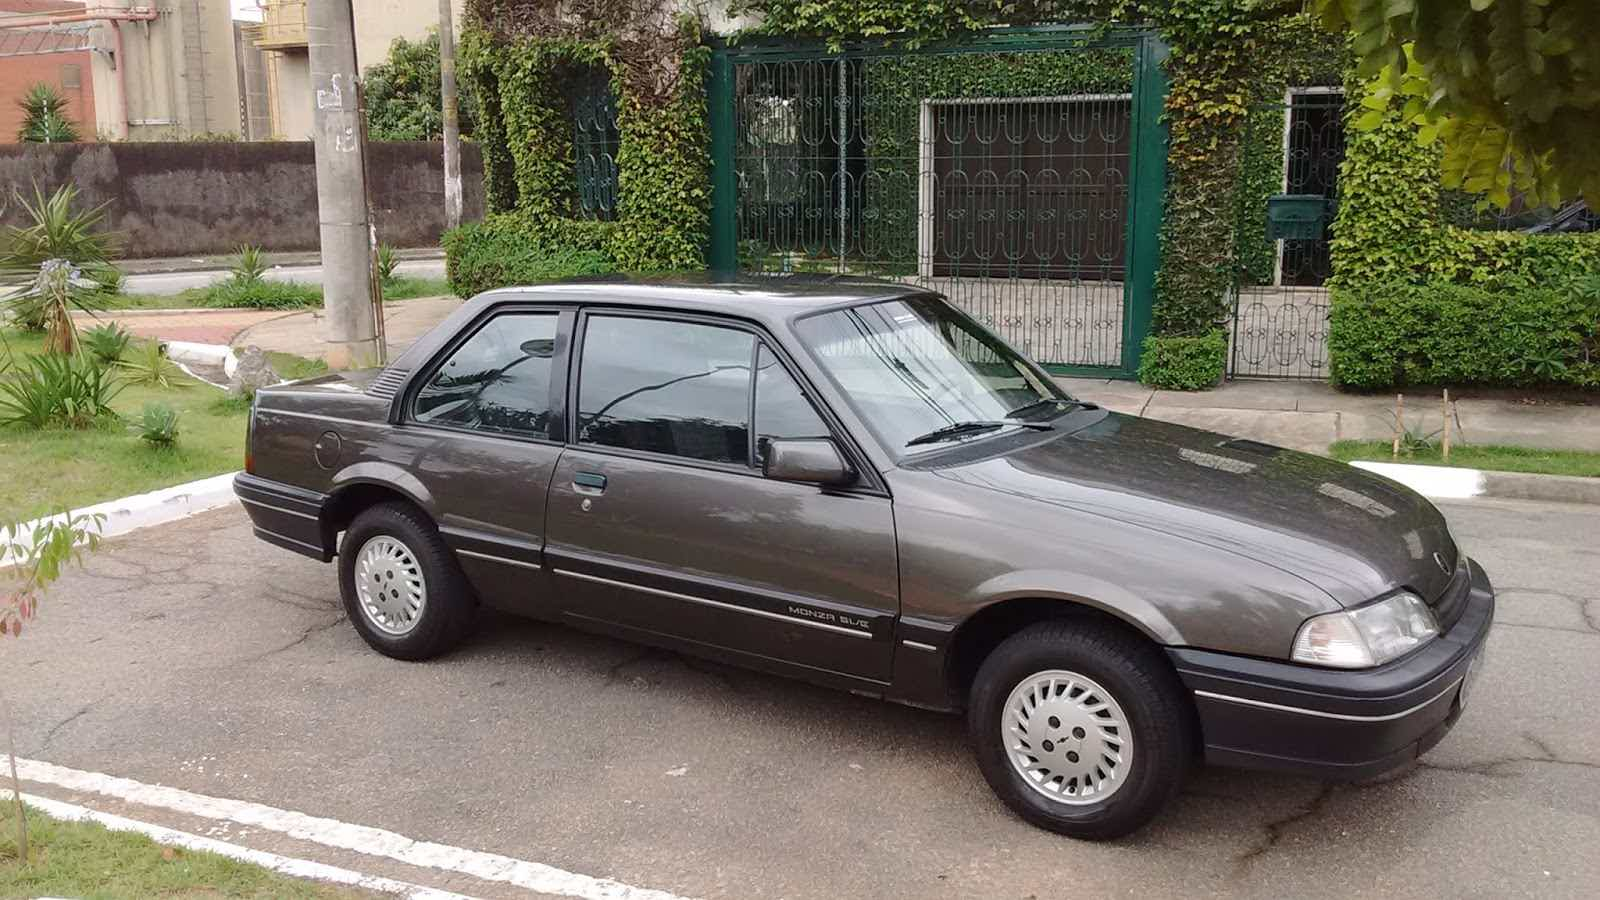 Monza SL 2.0 1991